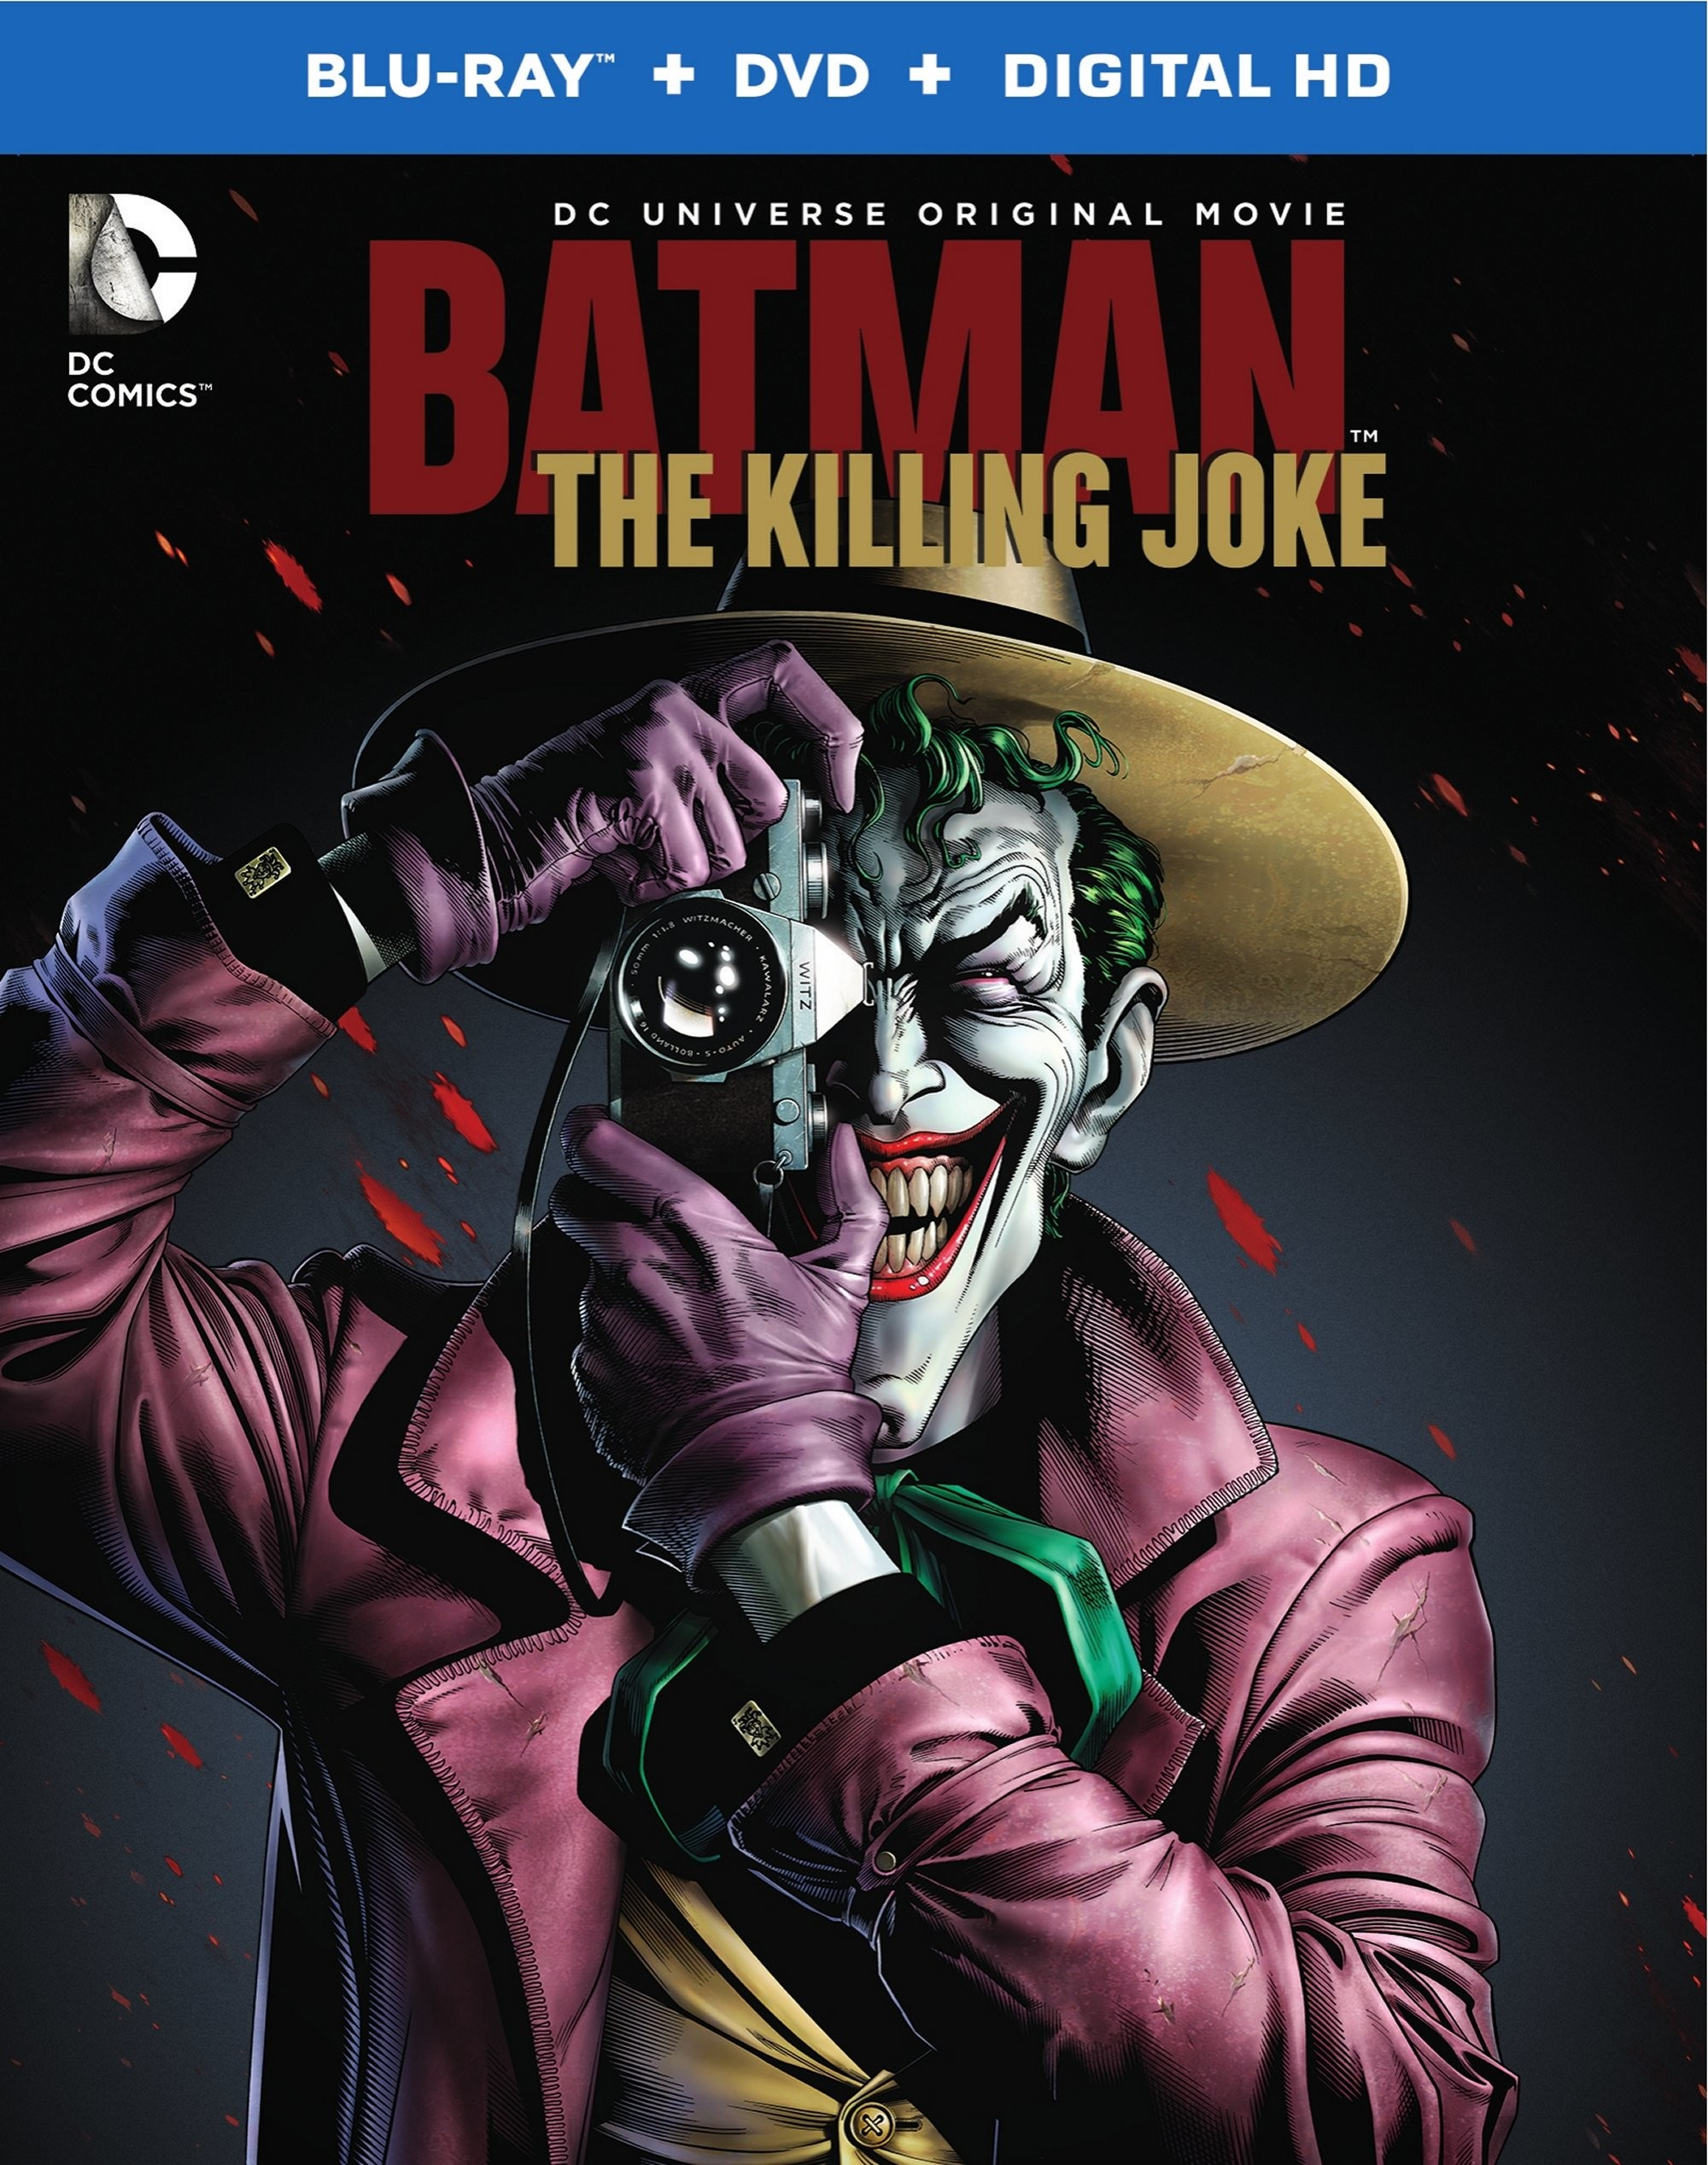 batman-the-killing-joke-blu-ray-box-art